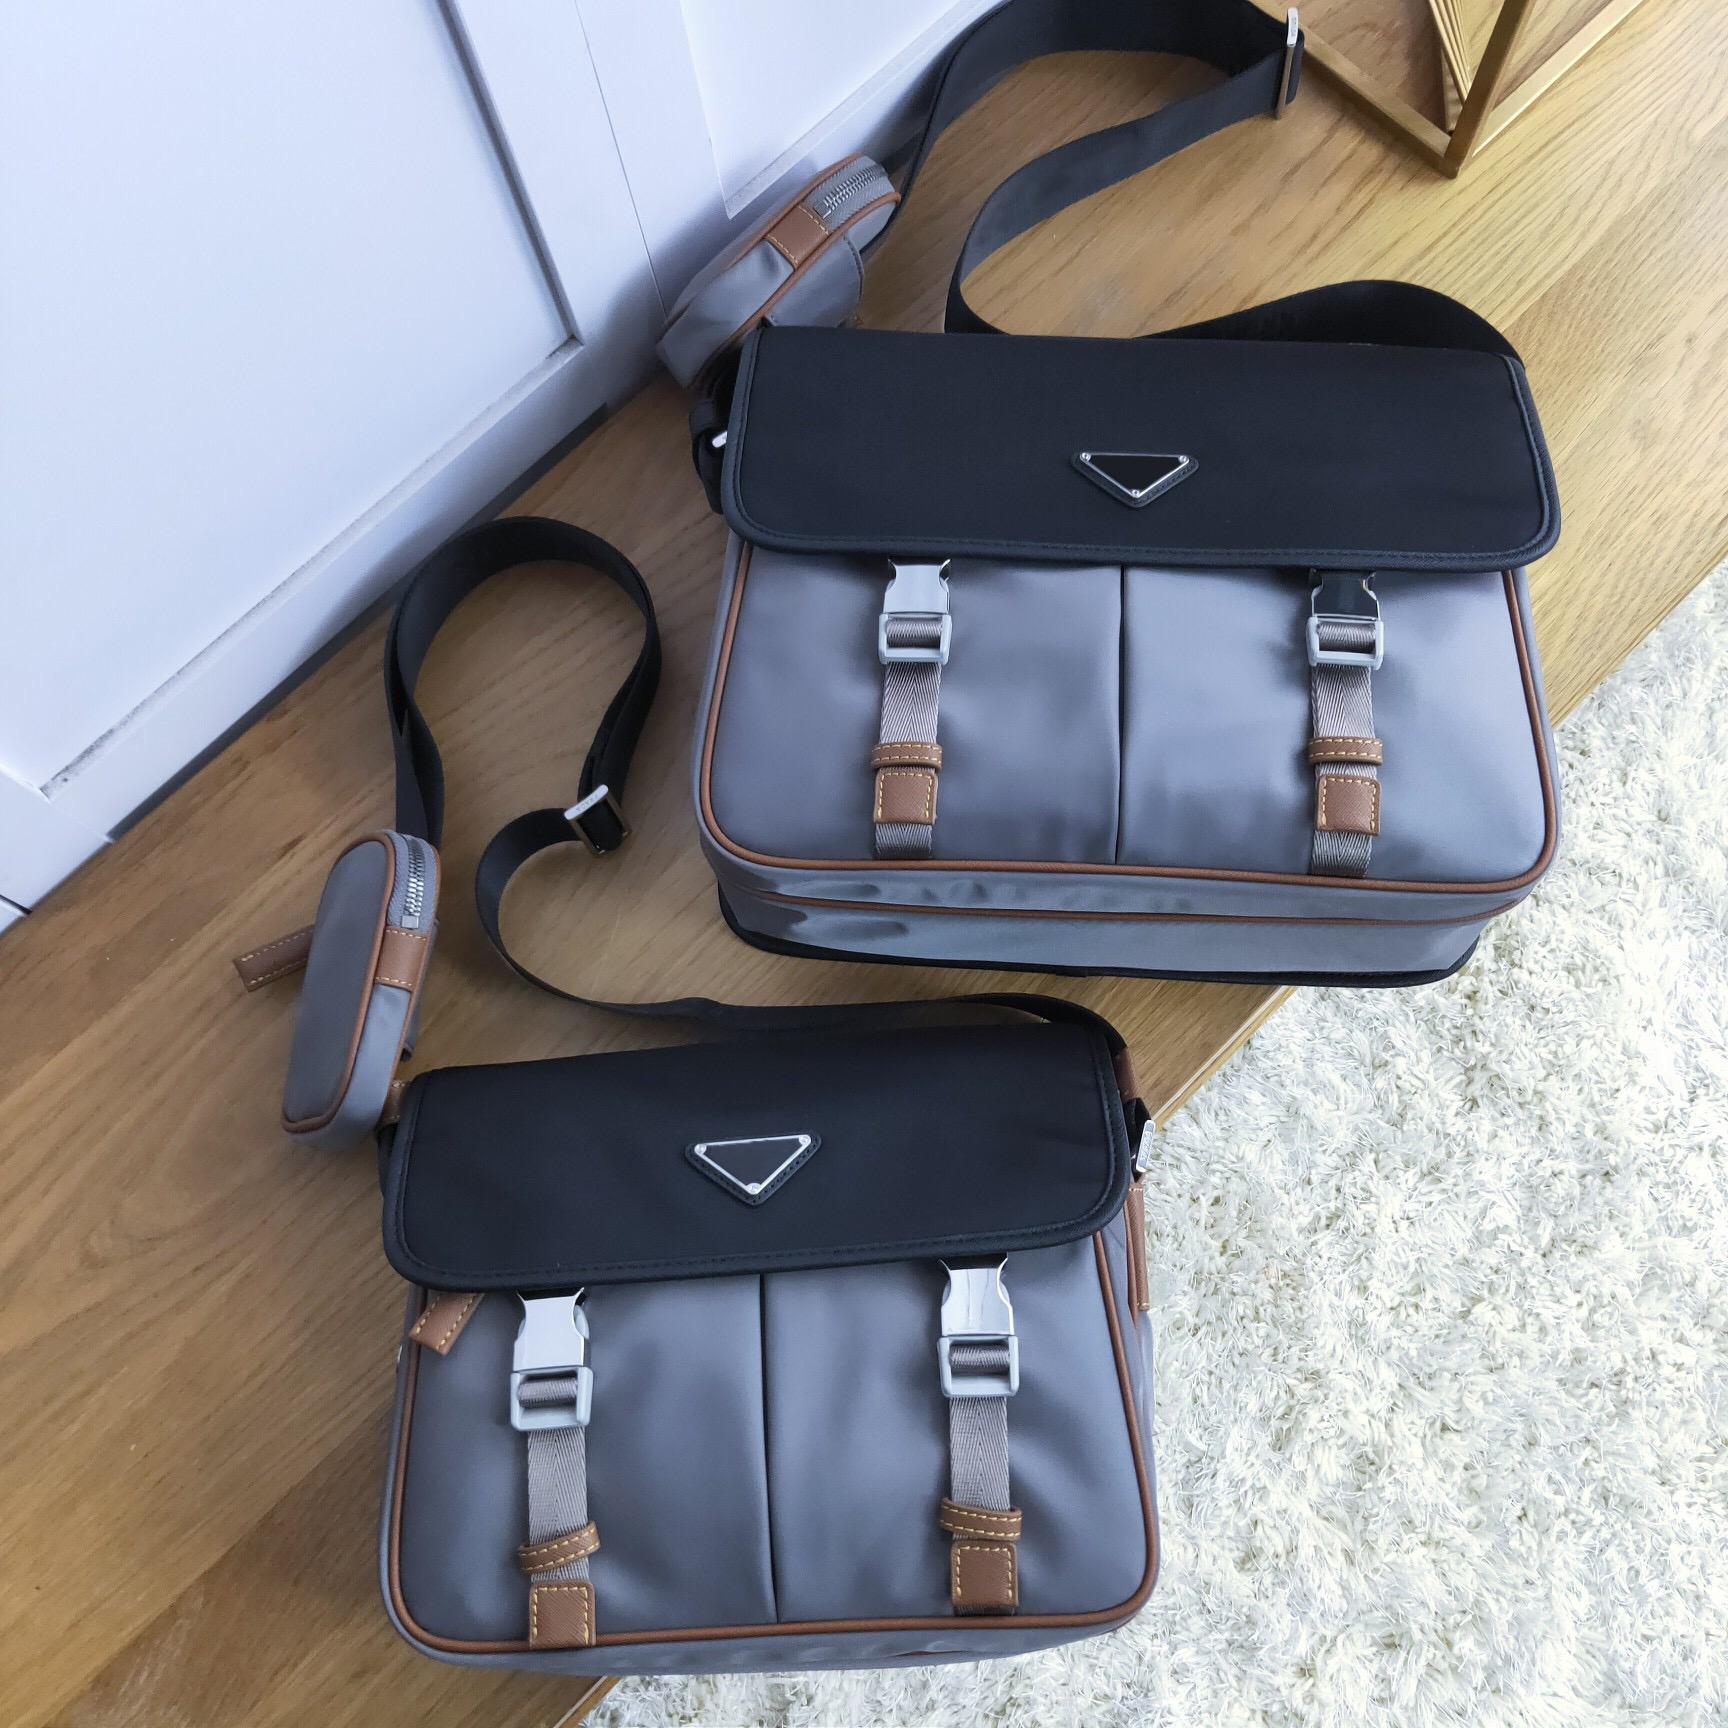 Nylon canvas with leather triangle postmans bag single shoulder crossbar buckle flap cloth bag messenger bag multi compartment